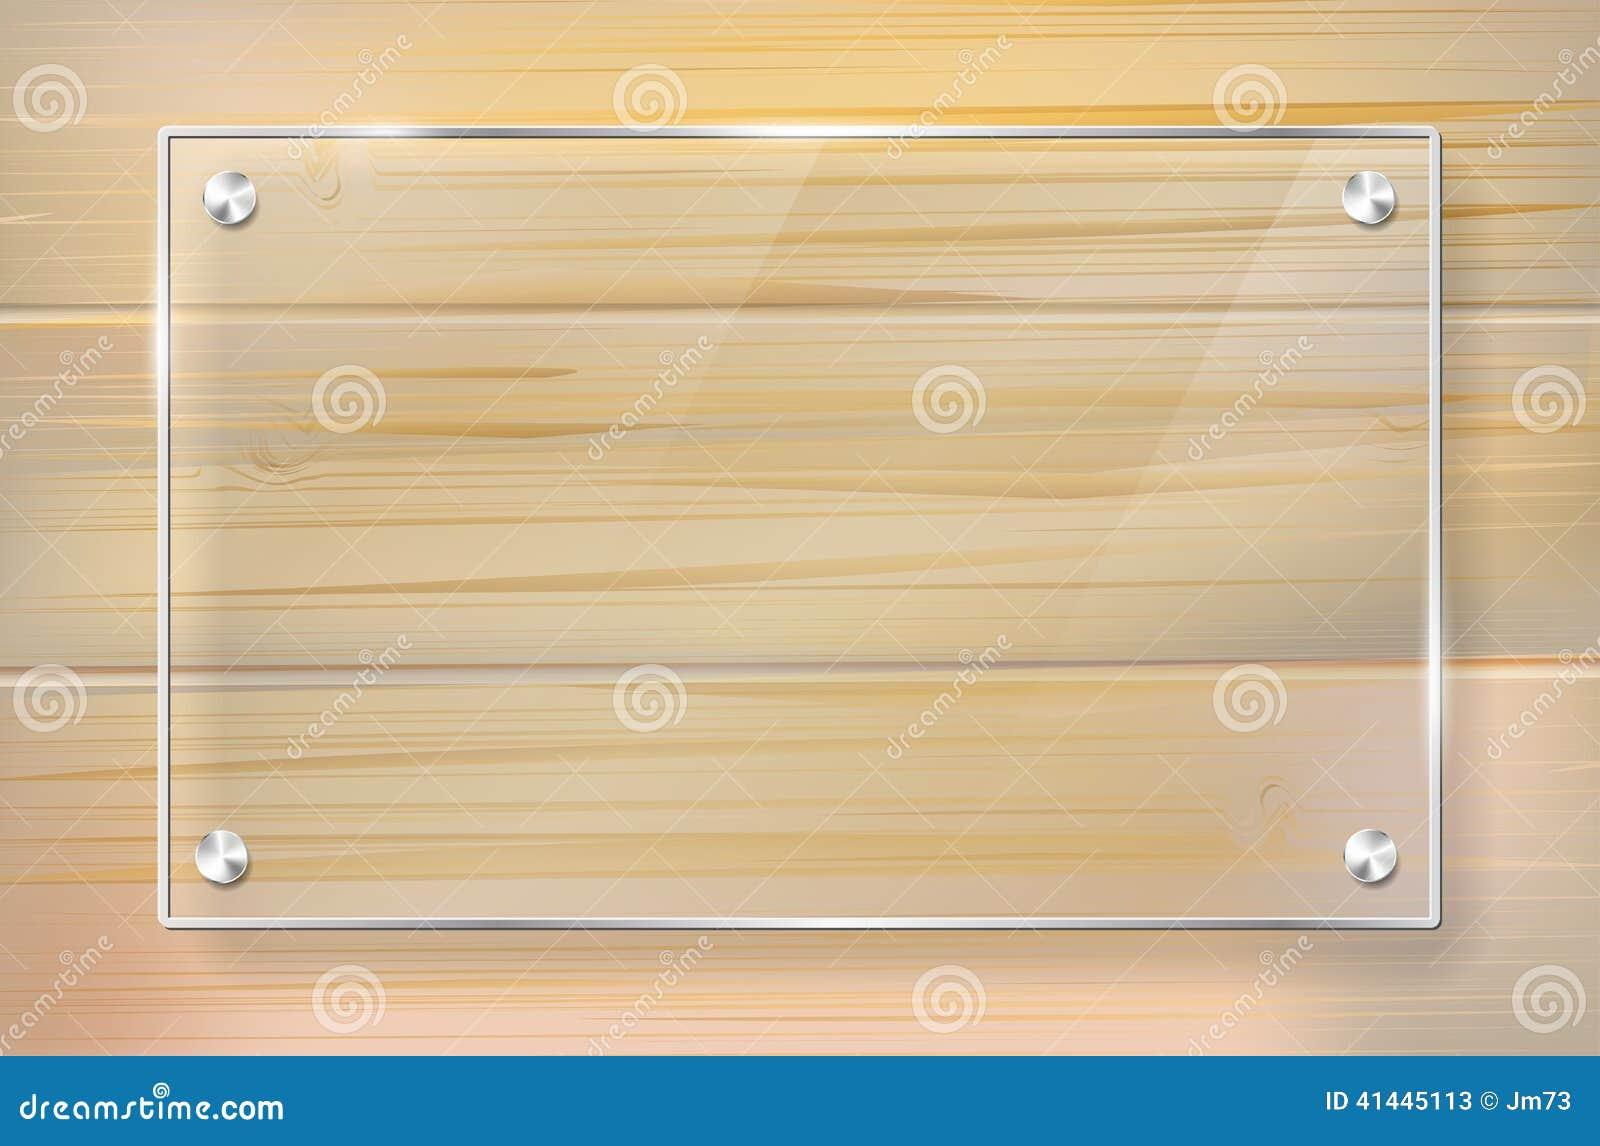 Marco de cristal transparente en fondo de madera - Marcos de cristal ...